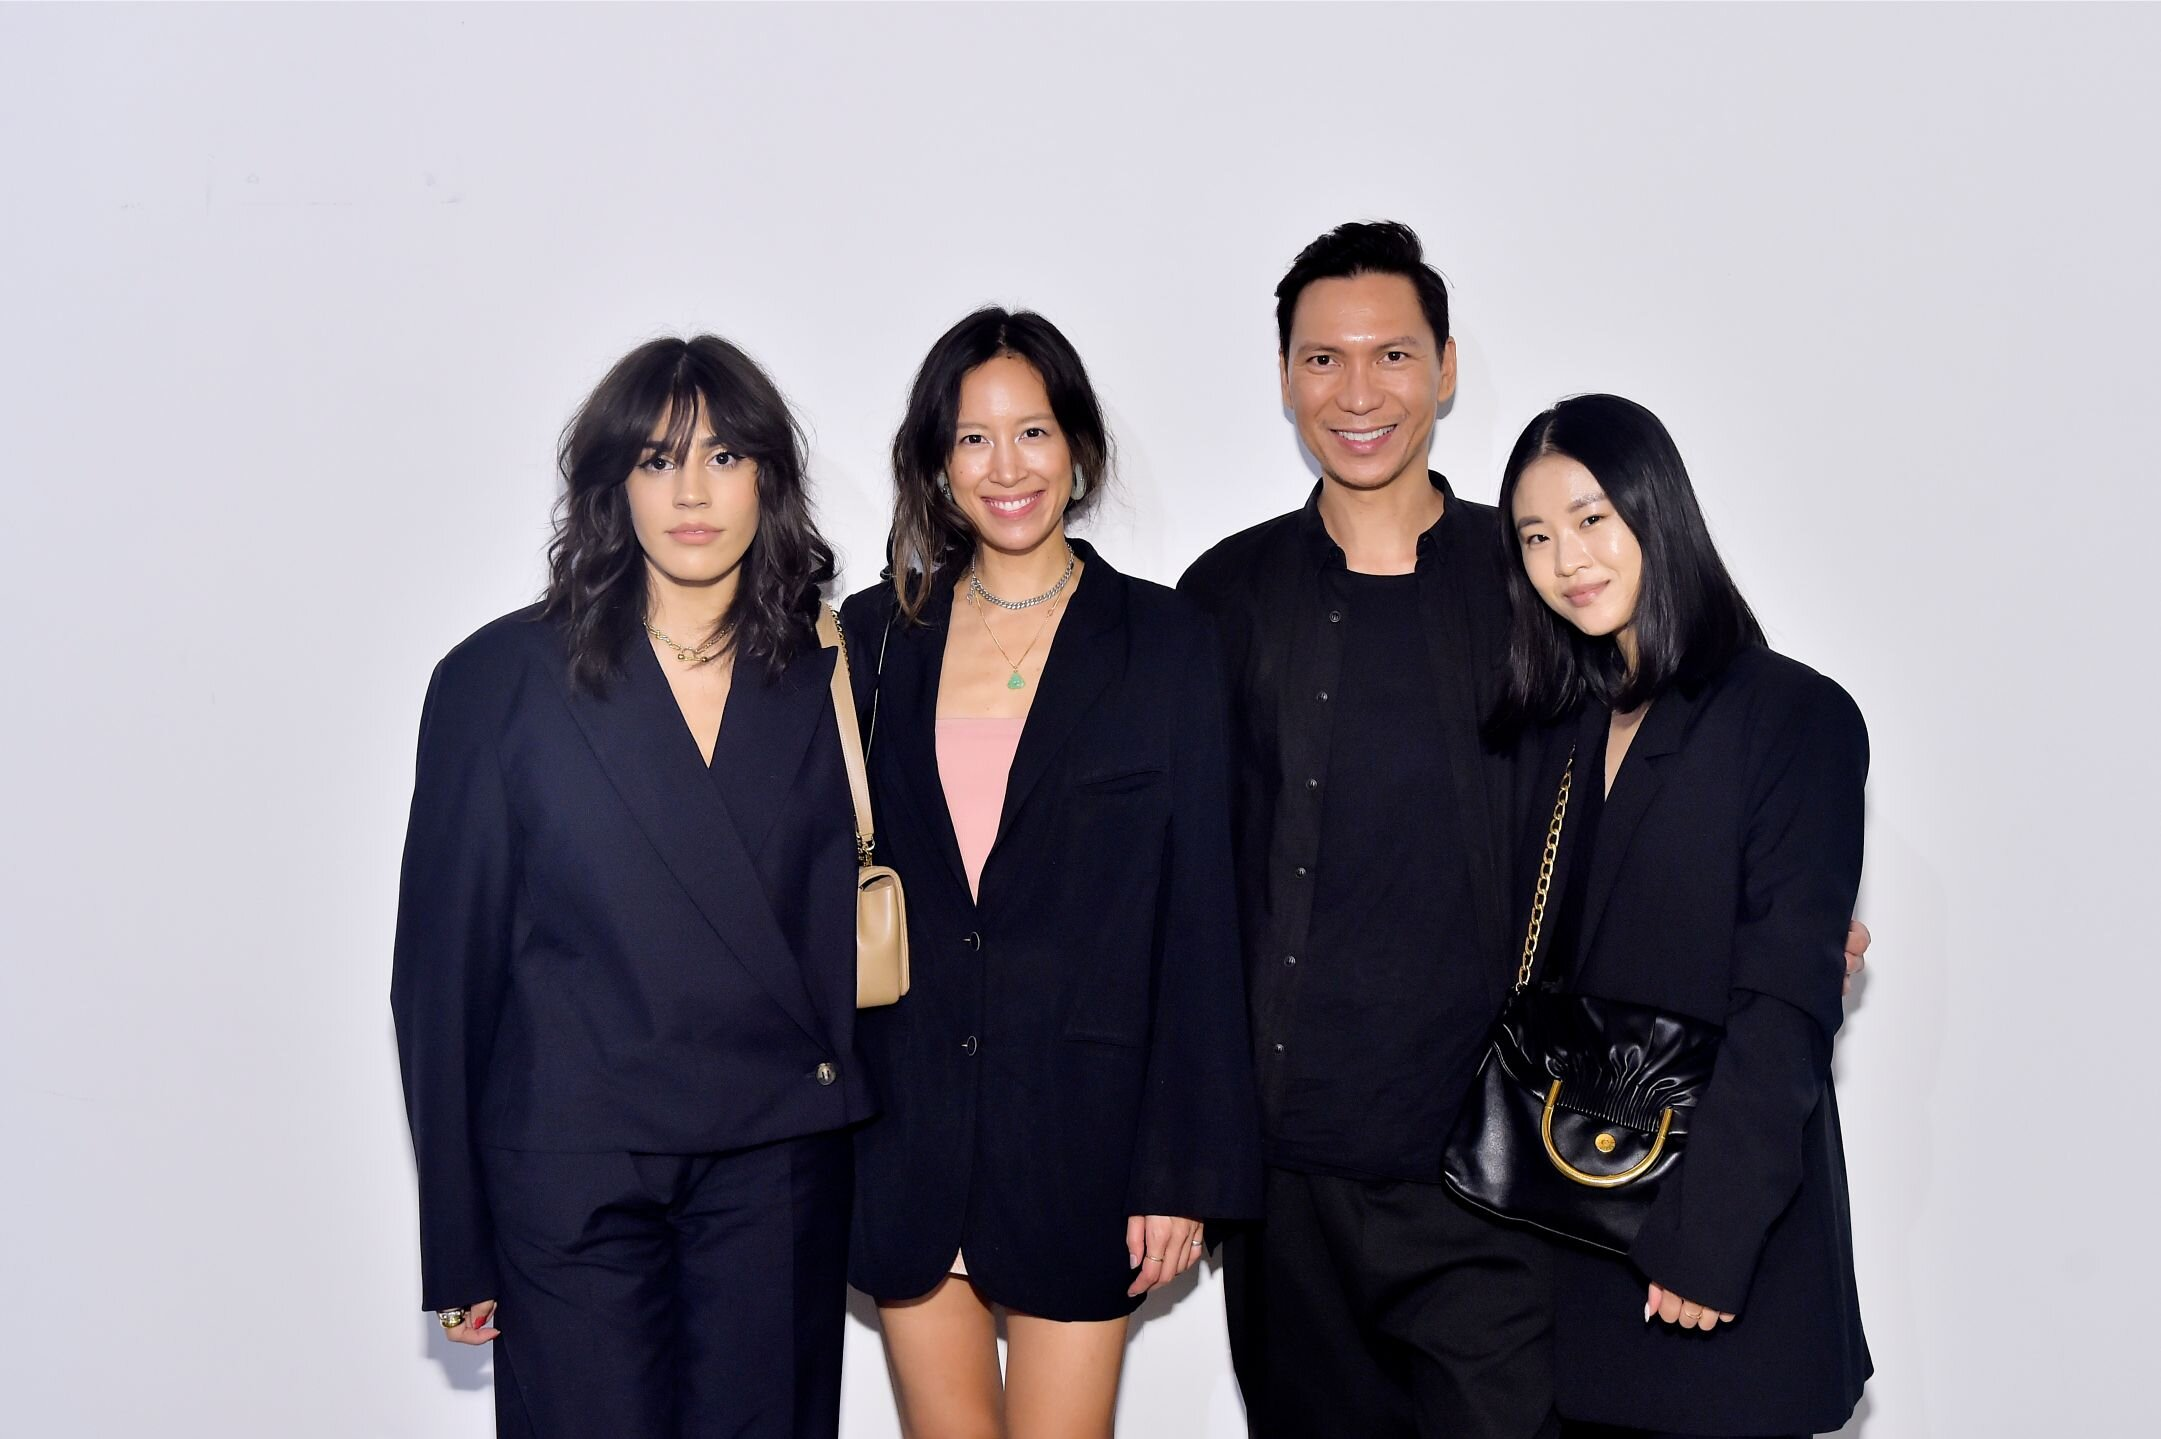 Orion Vanessa Carloto, Rachel Nguyen, Fong Liao and Minh Tran